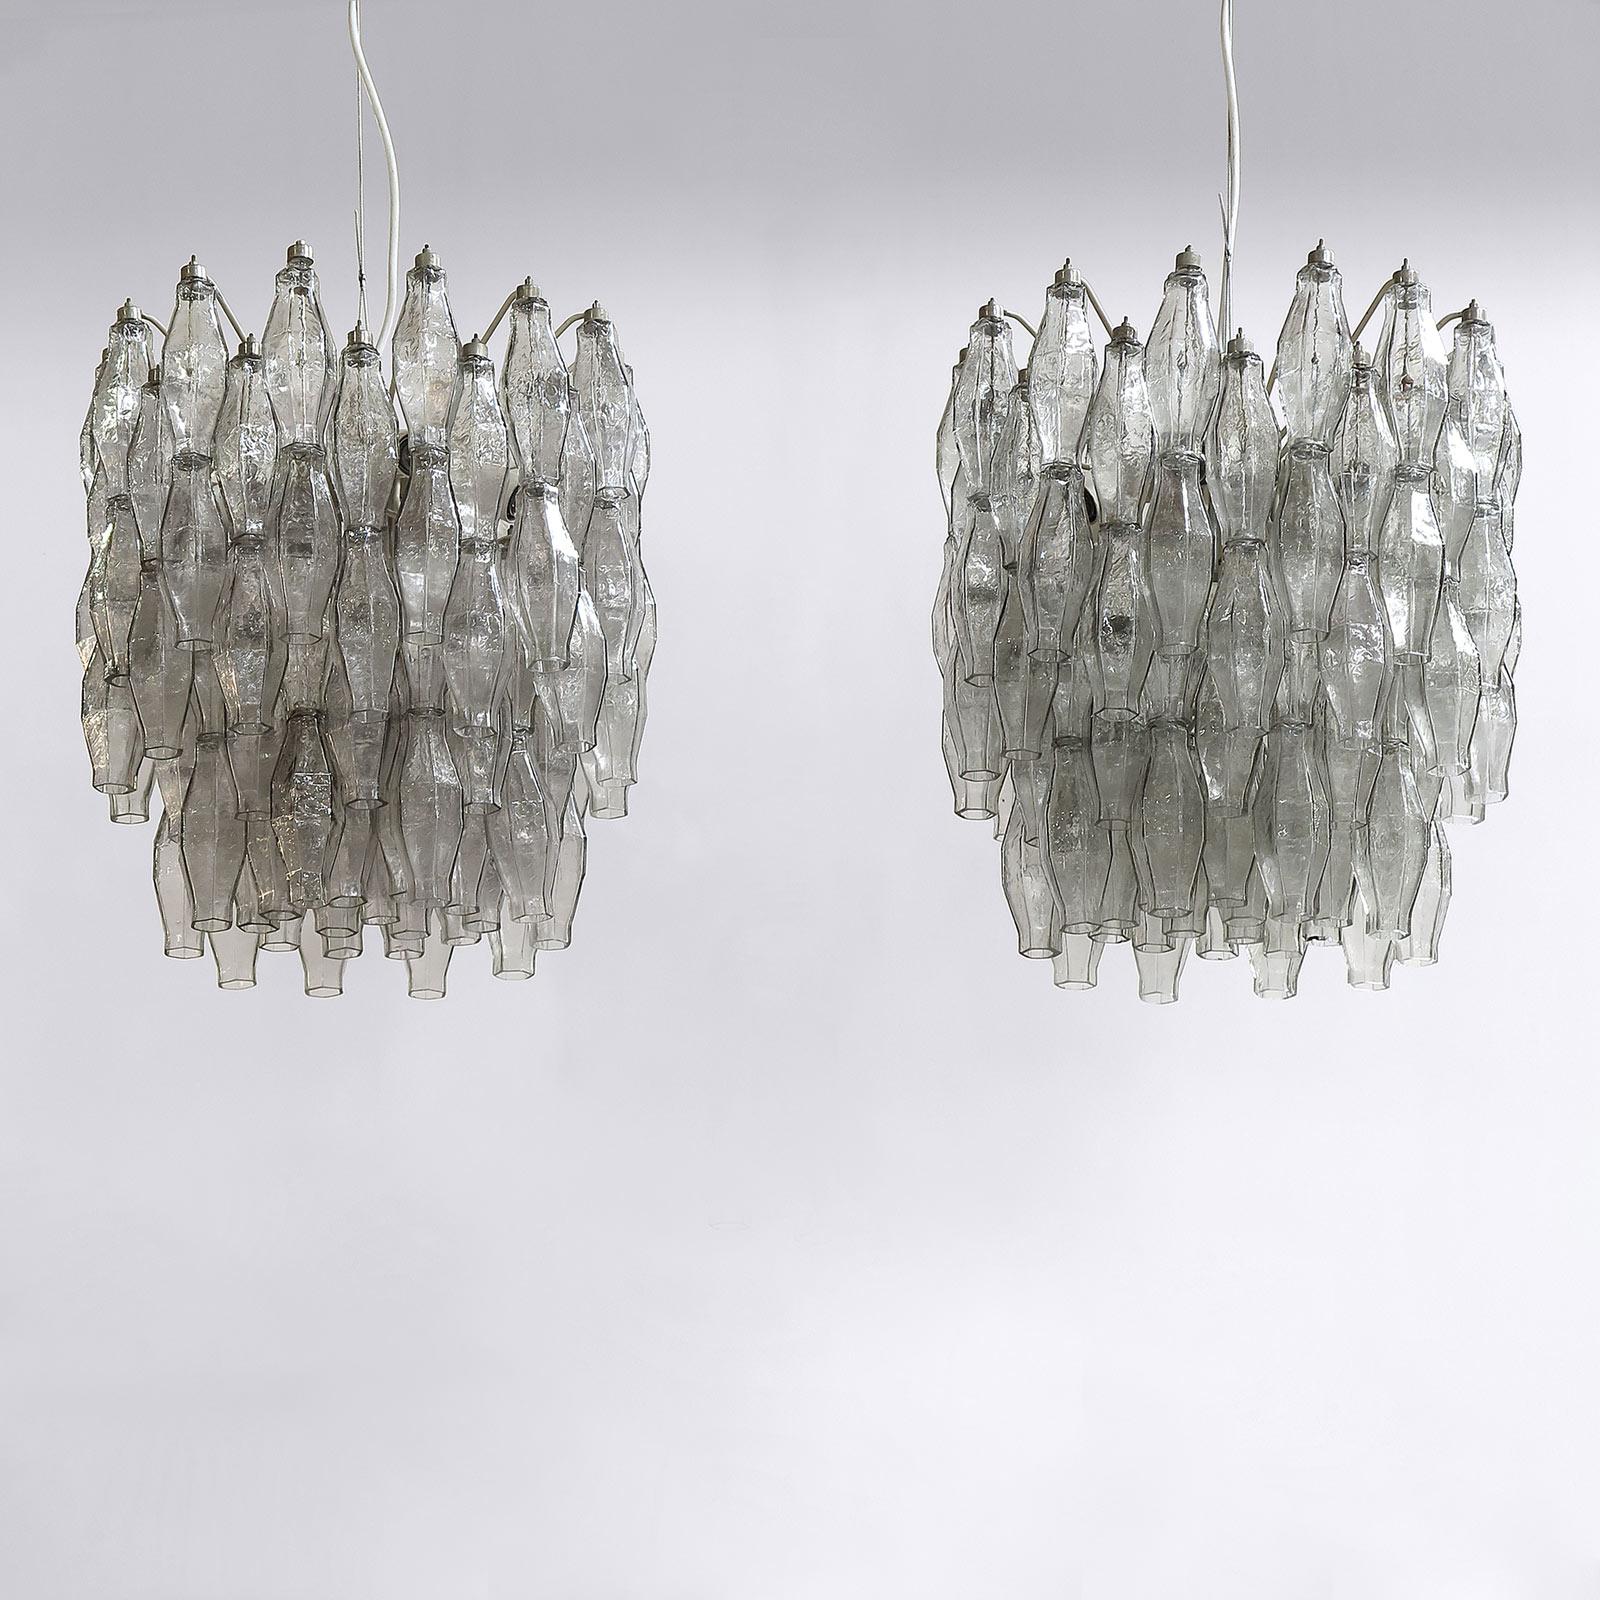 Poliedri chandeliers by venini nicholas alistair poliedri chandeliers by venini aloadofball Image collections